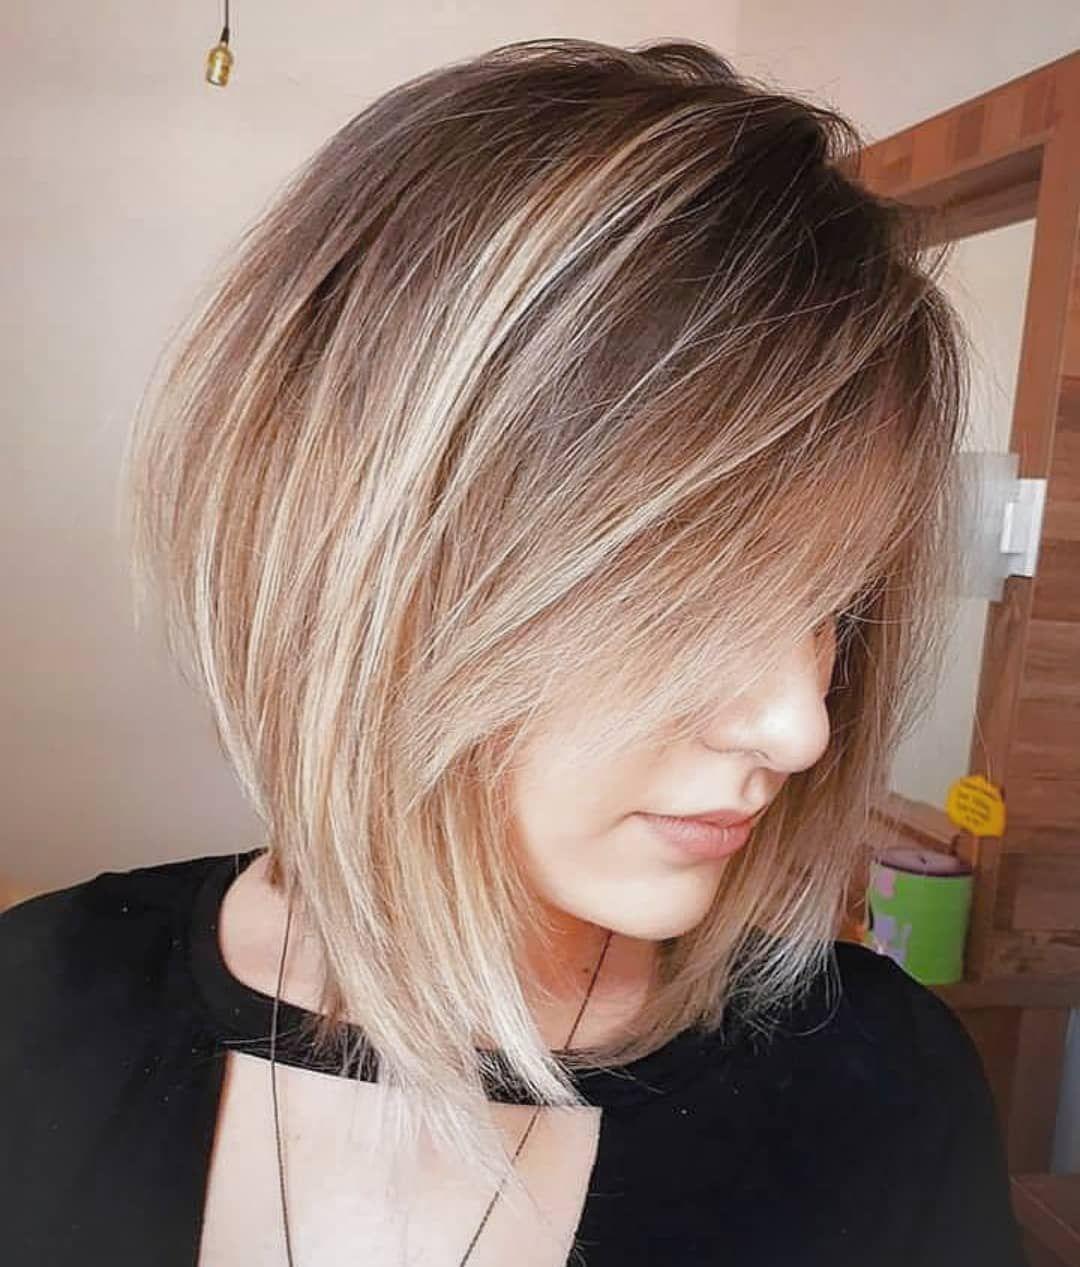 Stylish Choppy Lob Haircut For 2019 Women Shoulder Length Hairstyle Ideas Lob Haircut Haircut For Thick Hair Thick Hair Styles